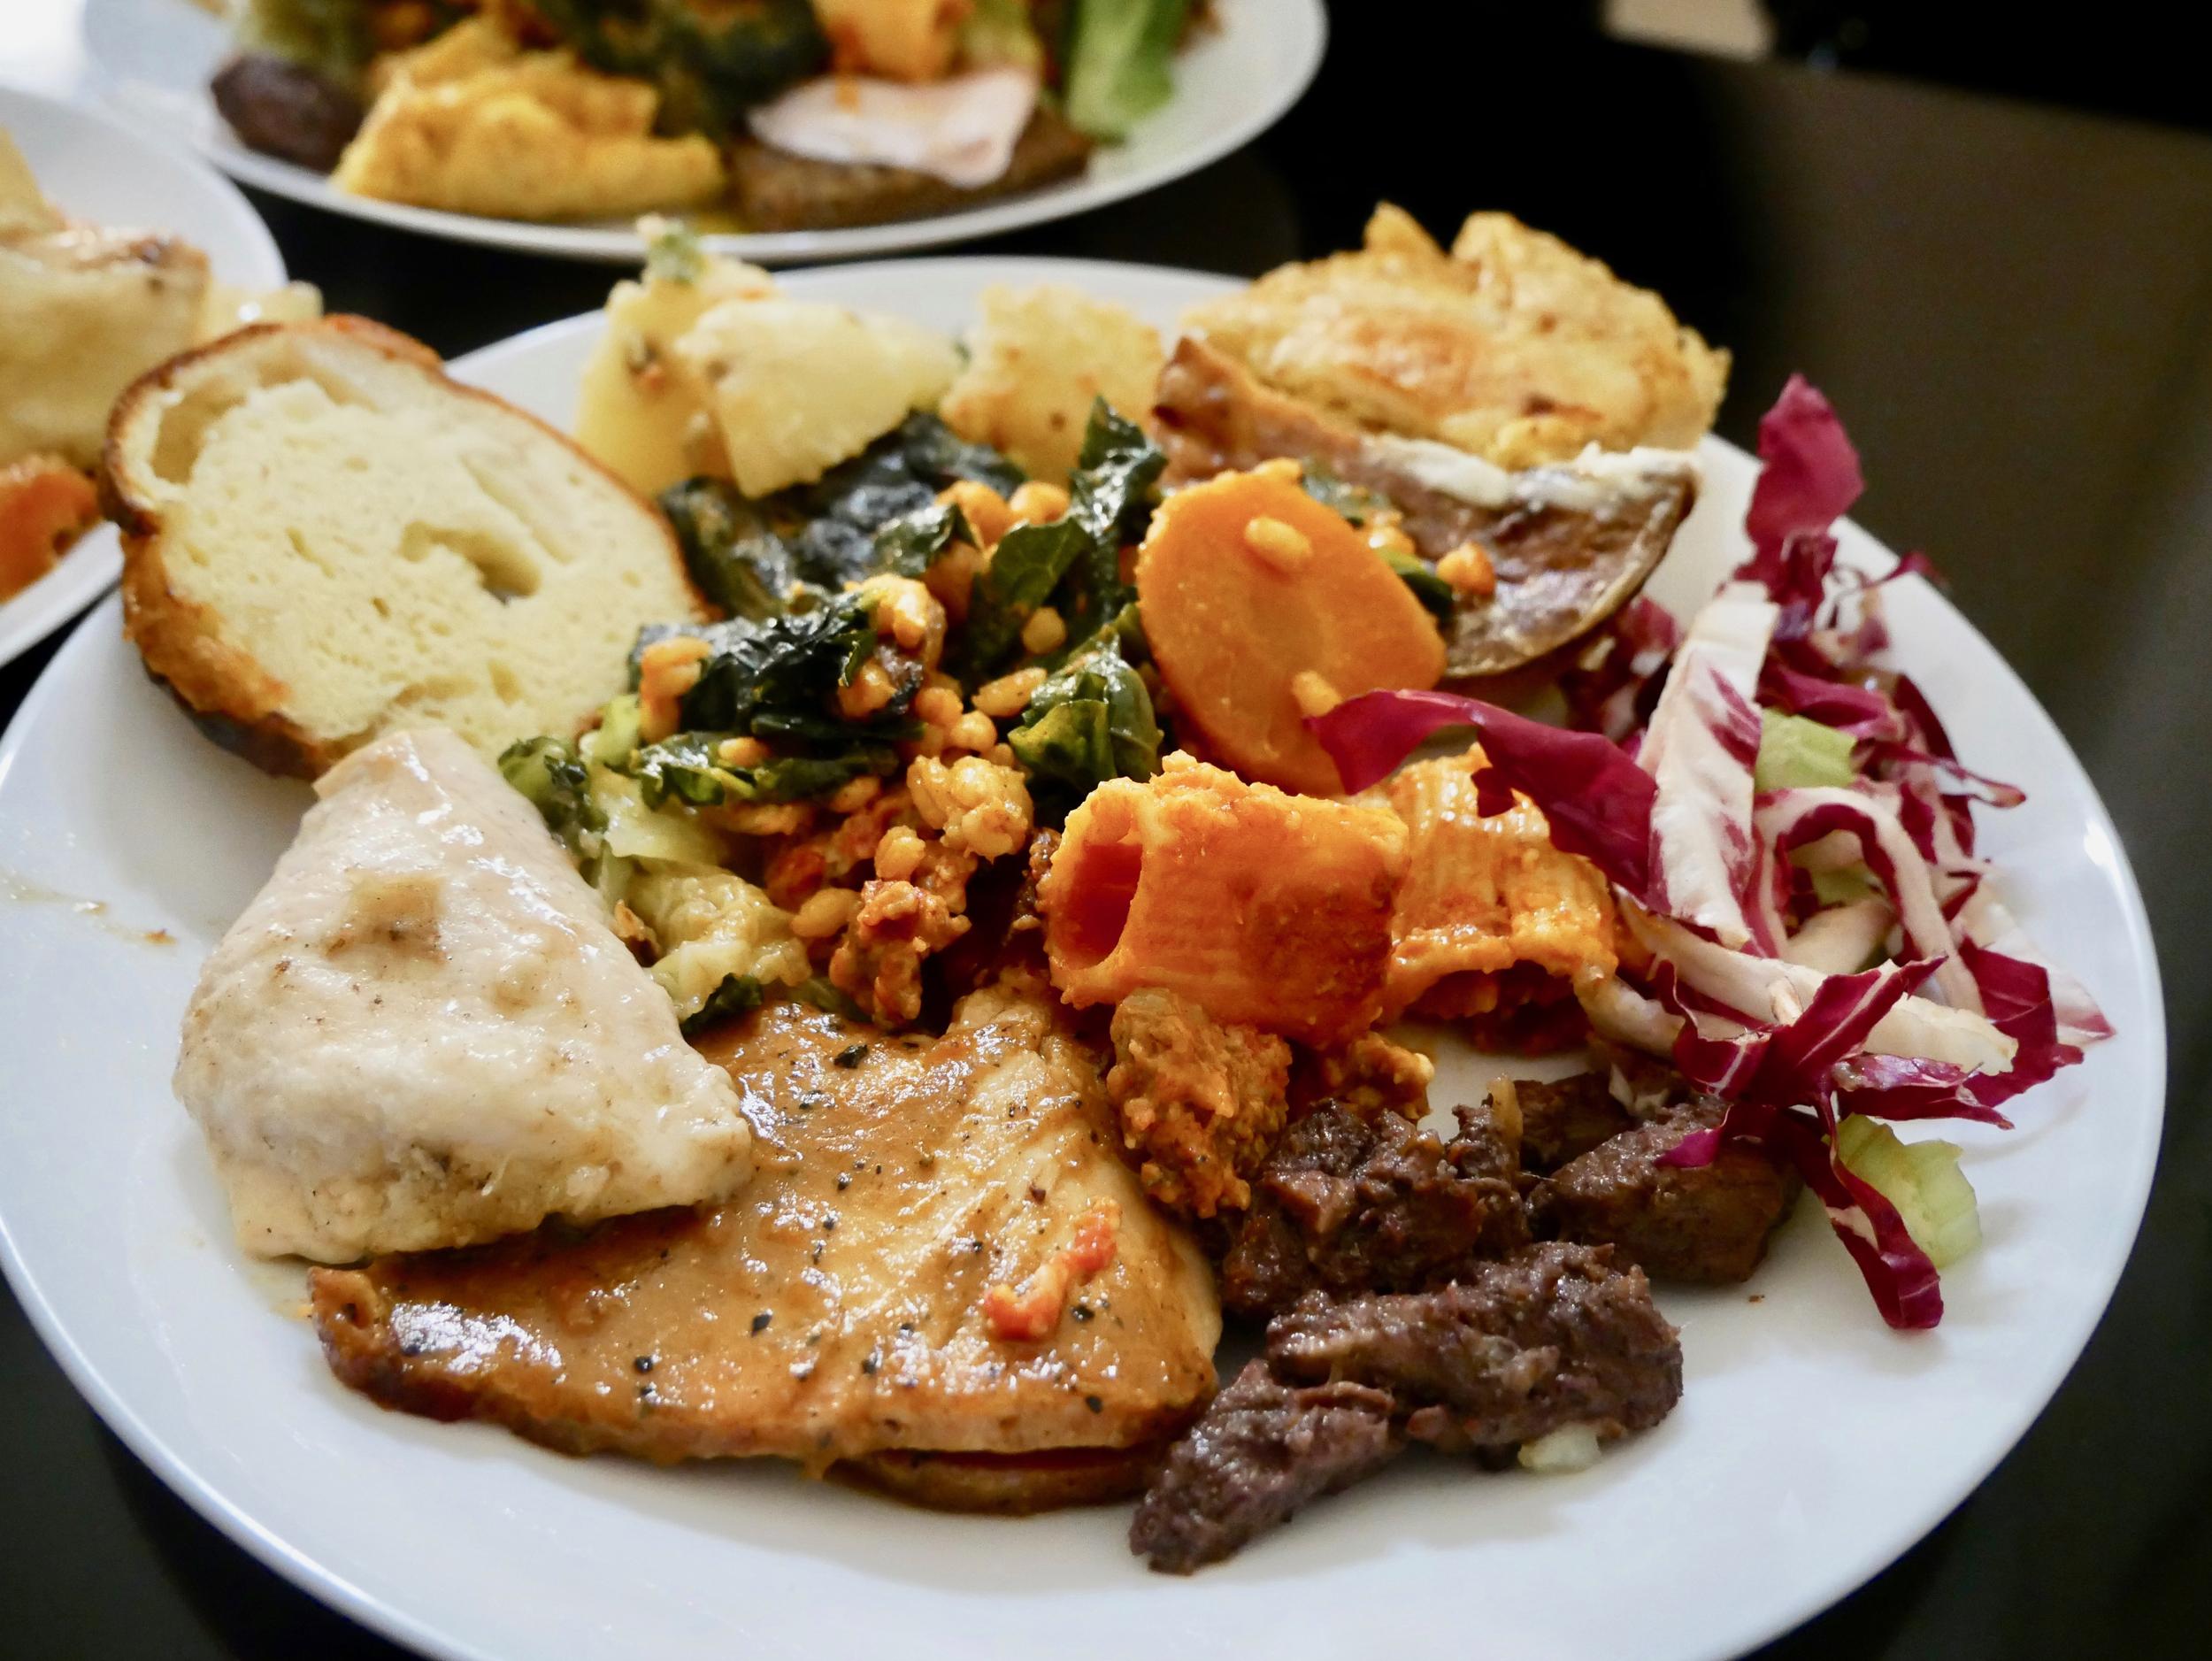 Beerba food 1